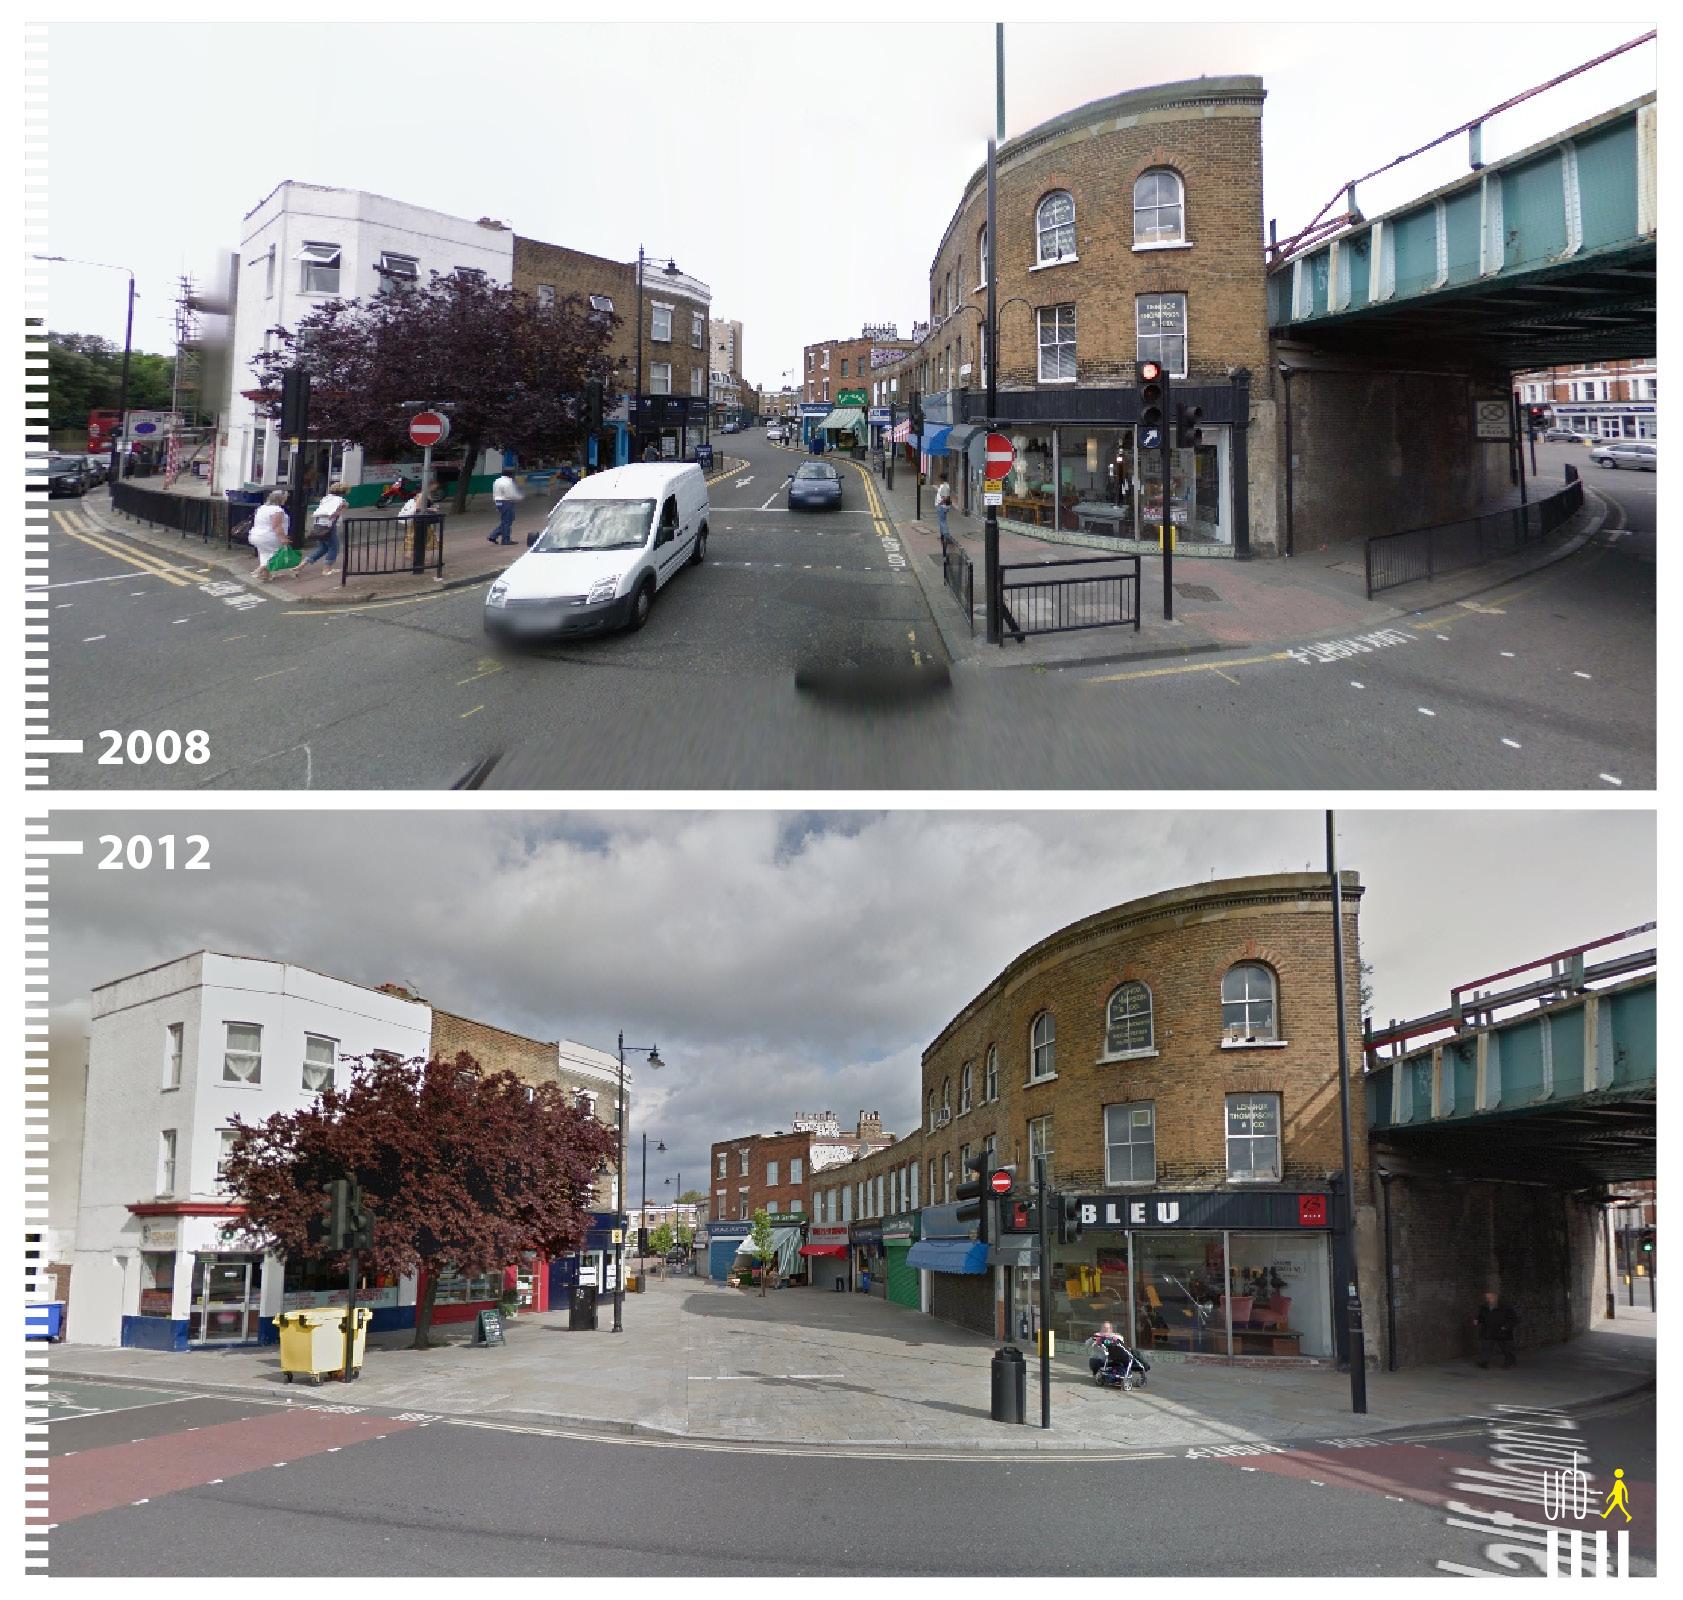 0433 UK London Half Moon Lane